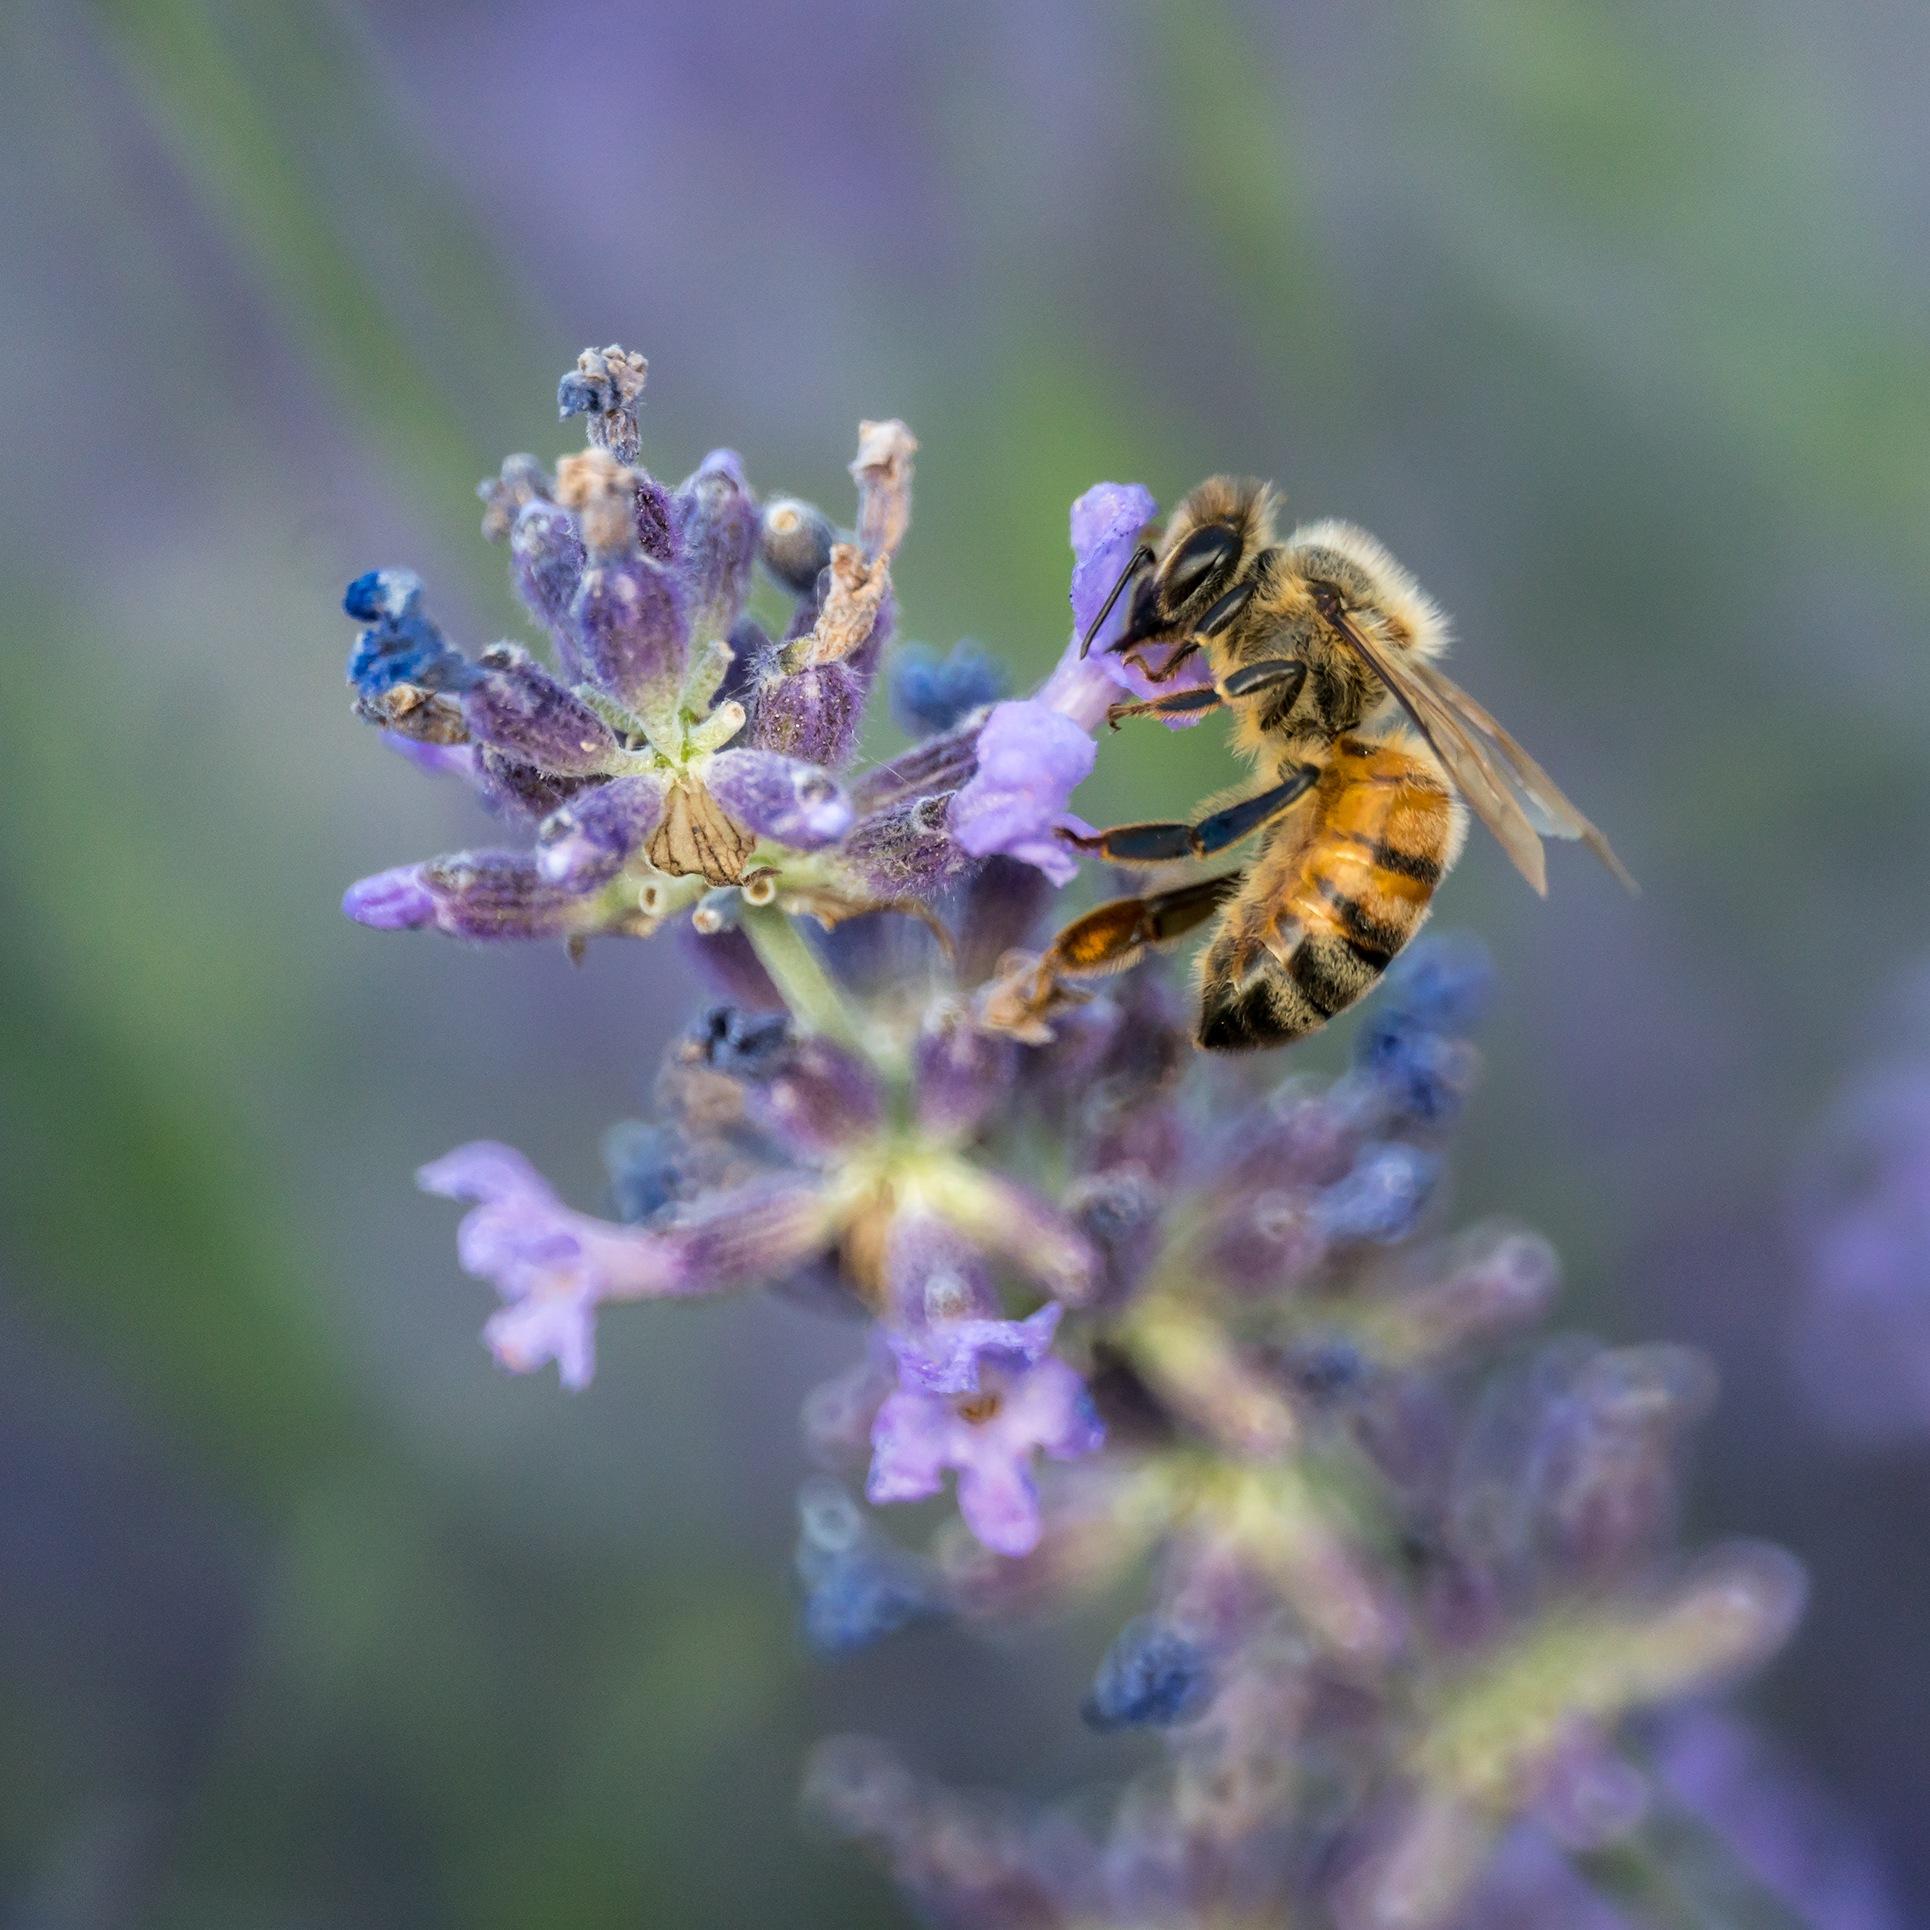 Lavender Honey Bee by Bret Little